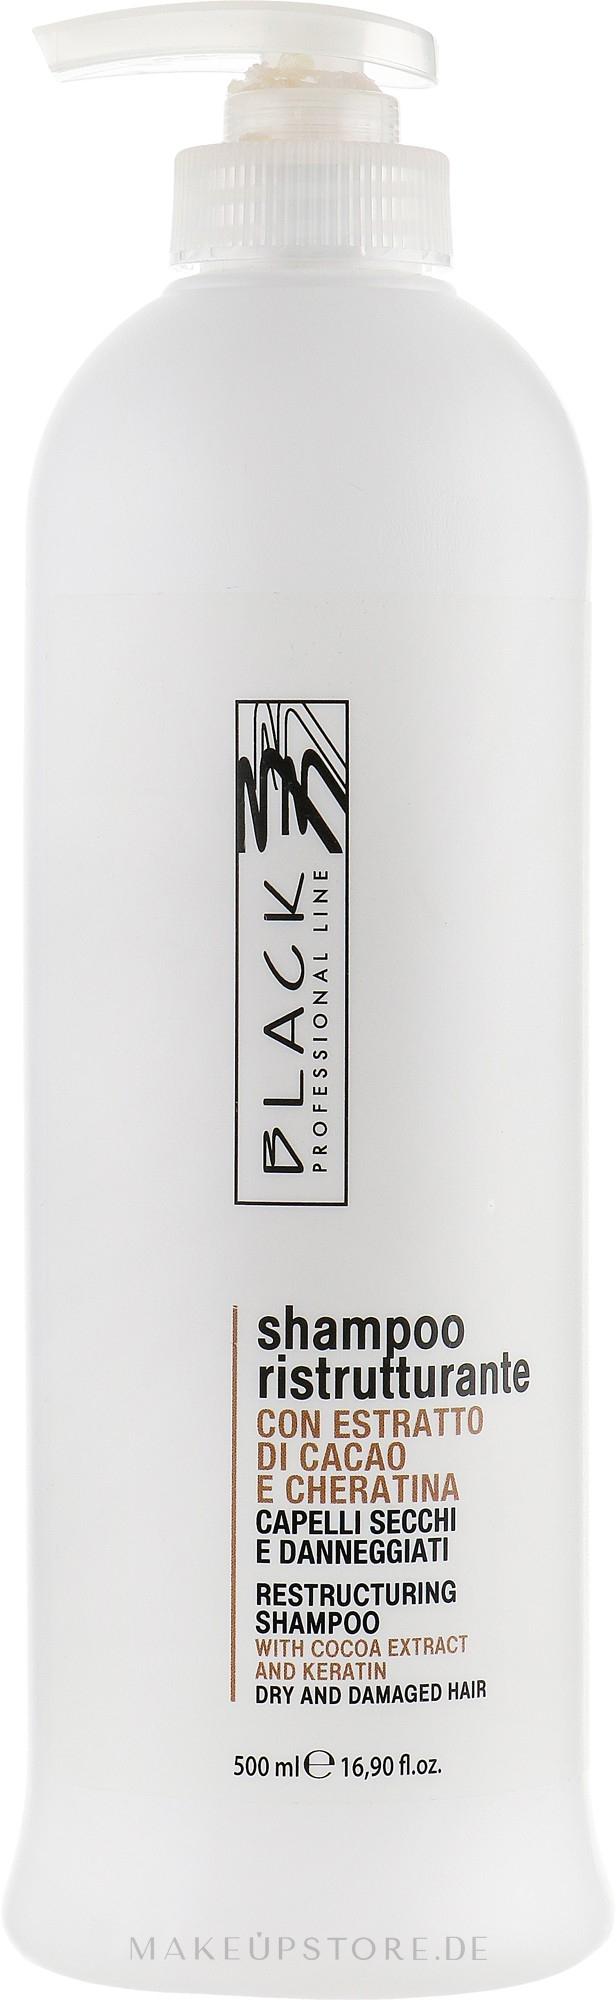 Restrukturierendes Shampoo mit Kakao-Extrakt und Keratin - Black Professional Line Chocolate & Keratin Shampoo — Bild 500 ml